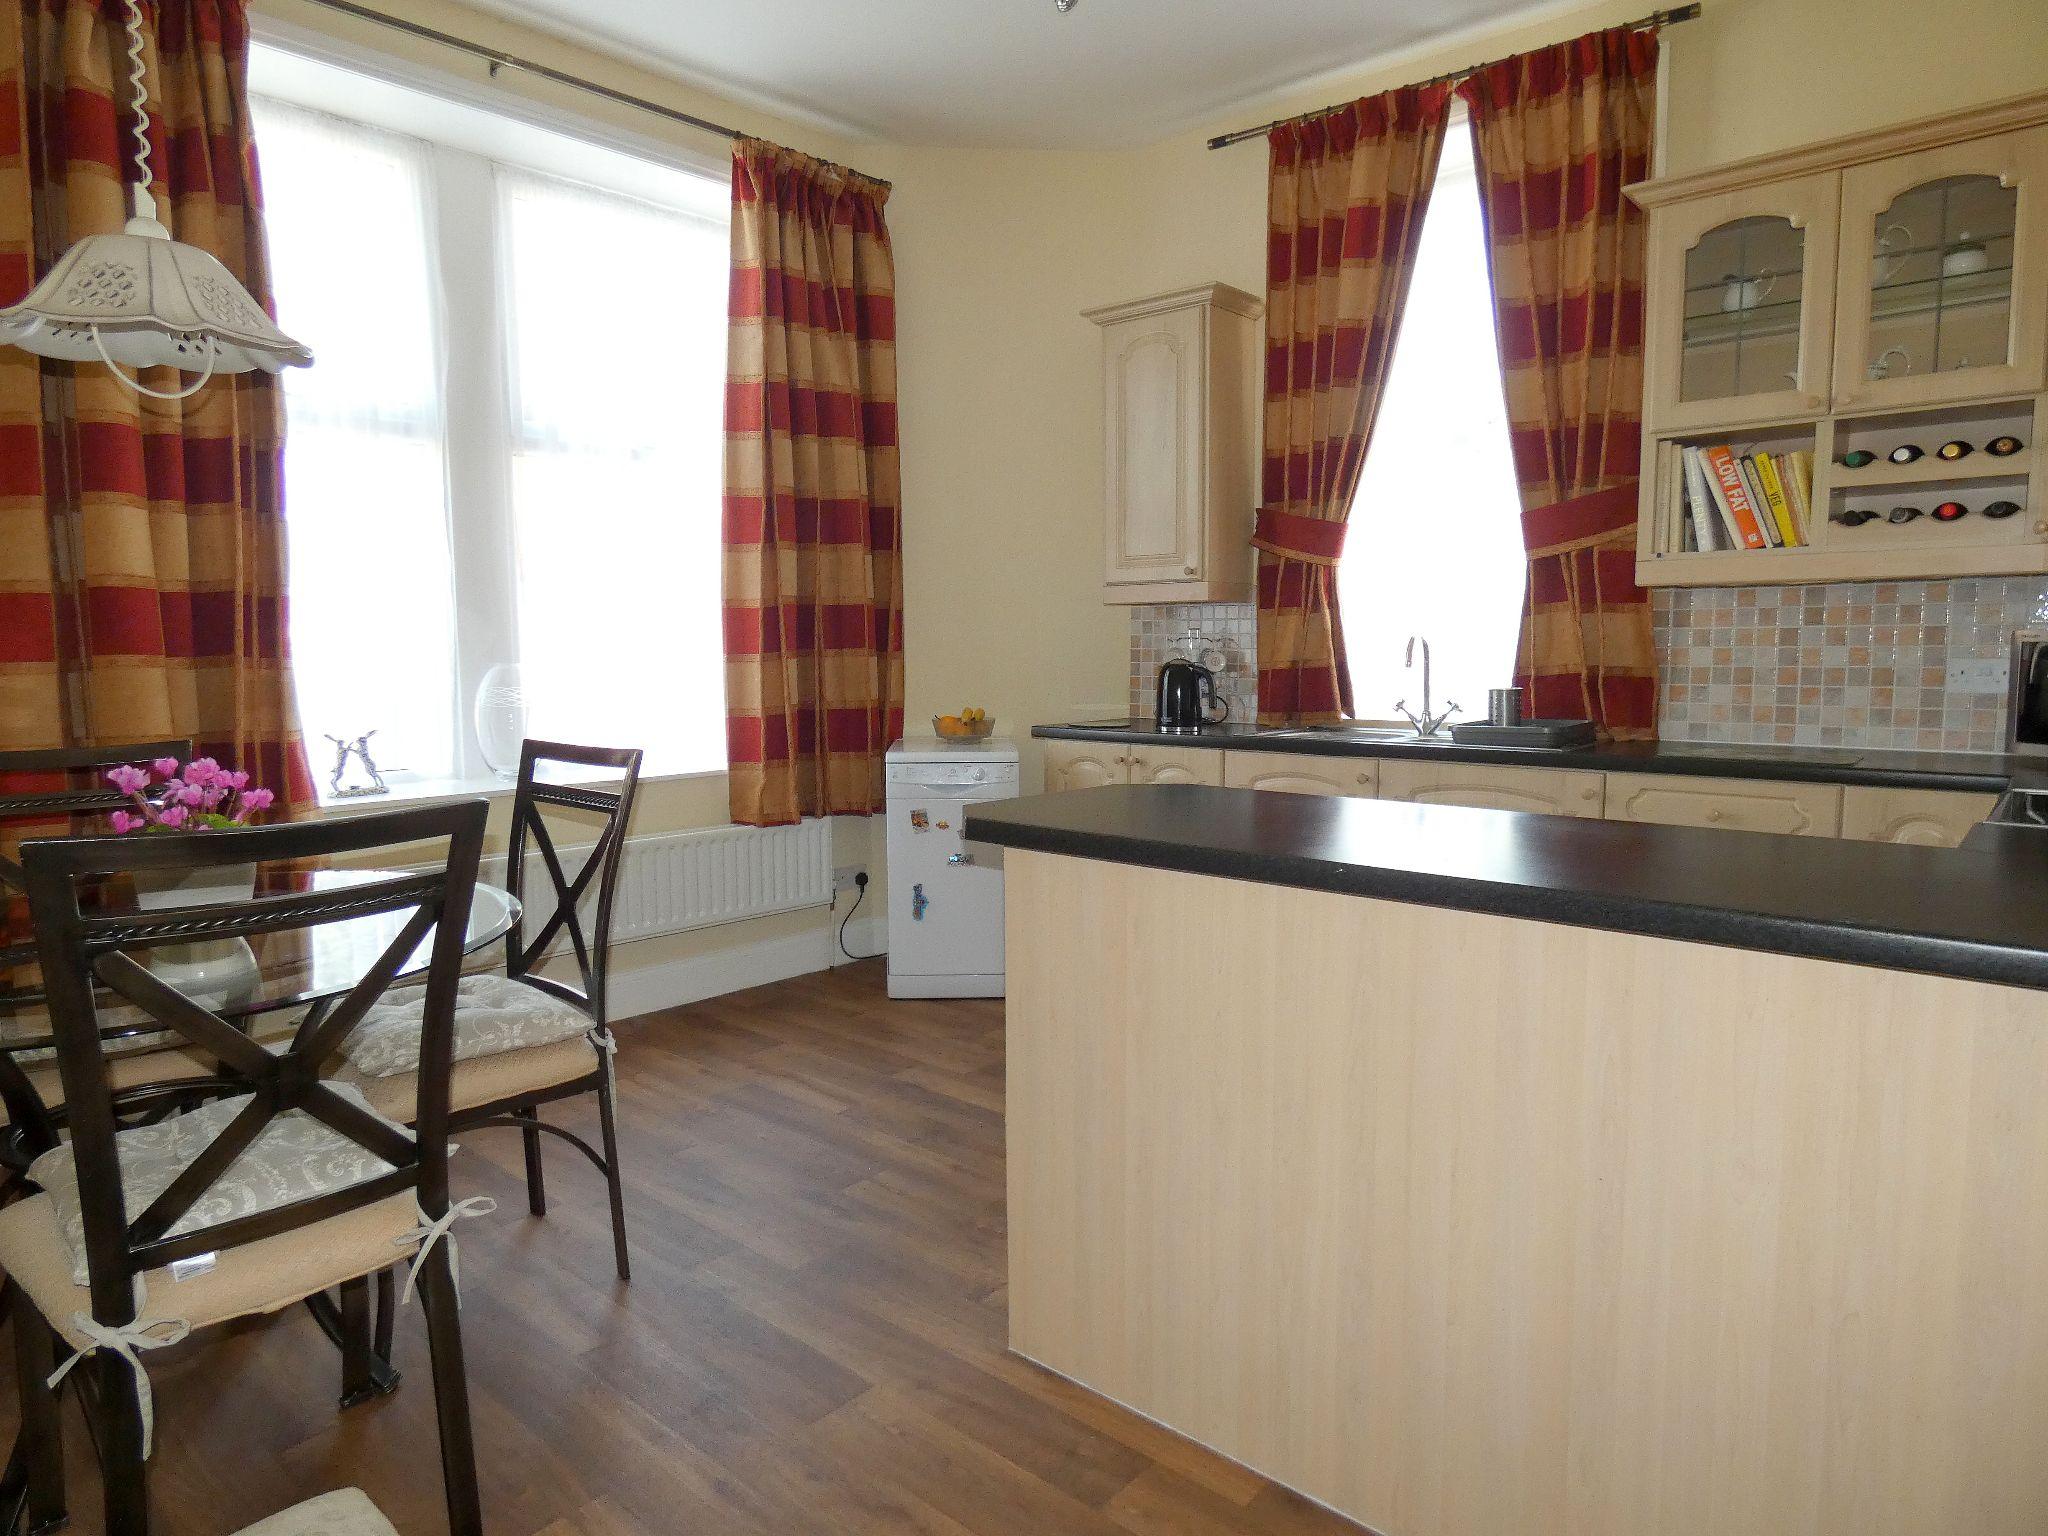 5 bedroom semi-detached house For Sale in Bishop Auckland - Kitchen Diner.